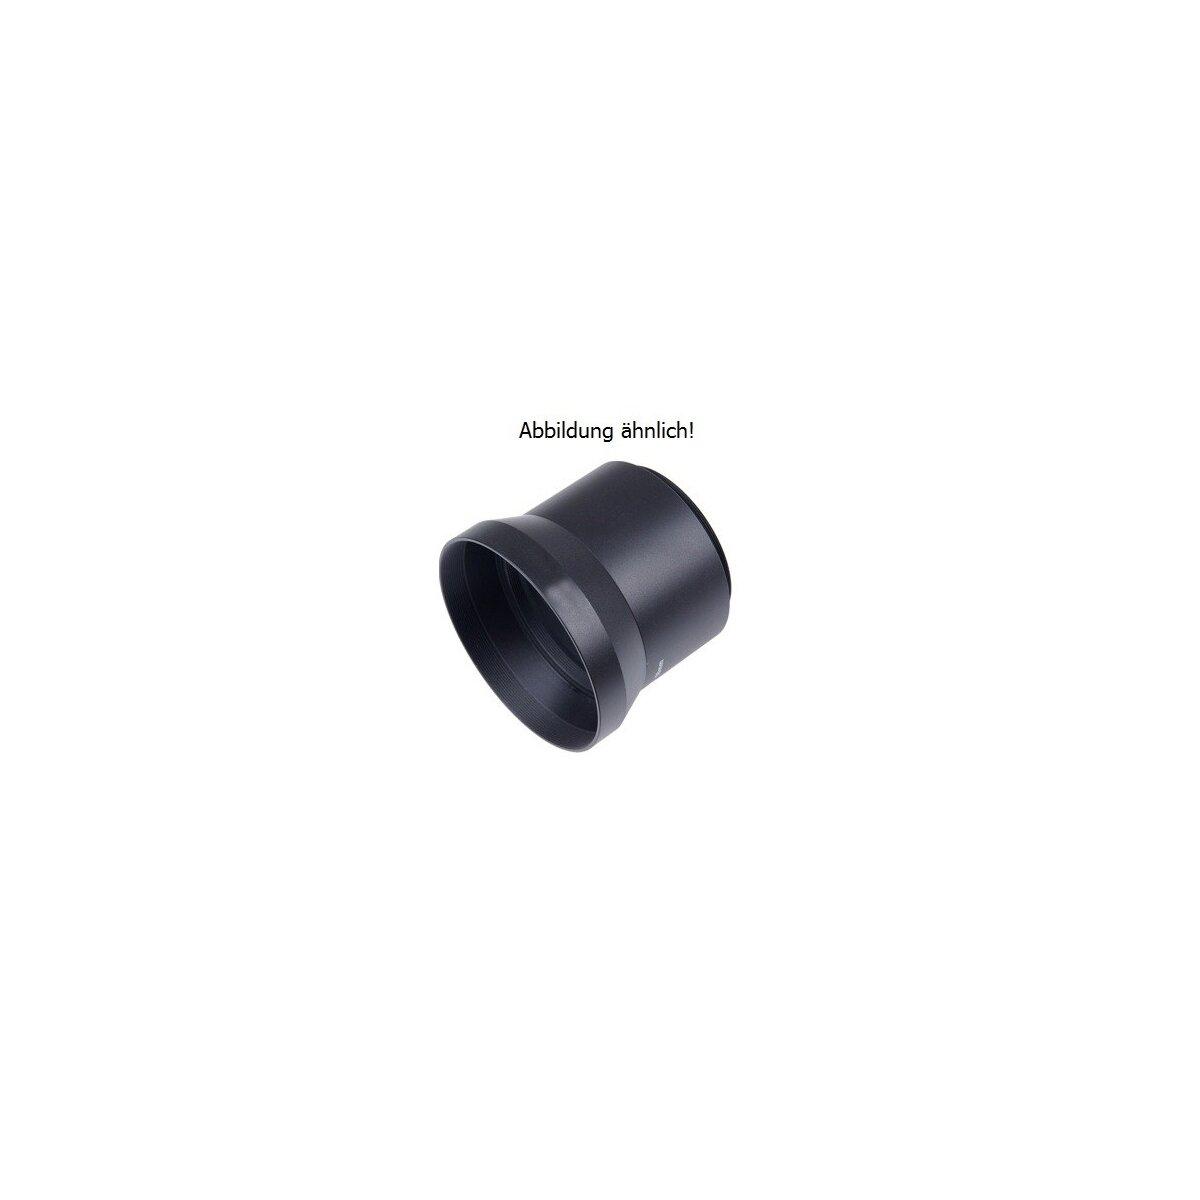 Adaptertubus fuer Canon PowerShot A610, A620, A630, A640 - in schwarz